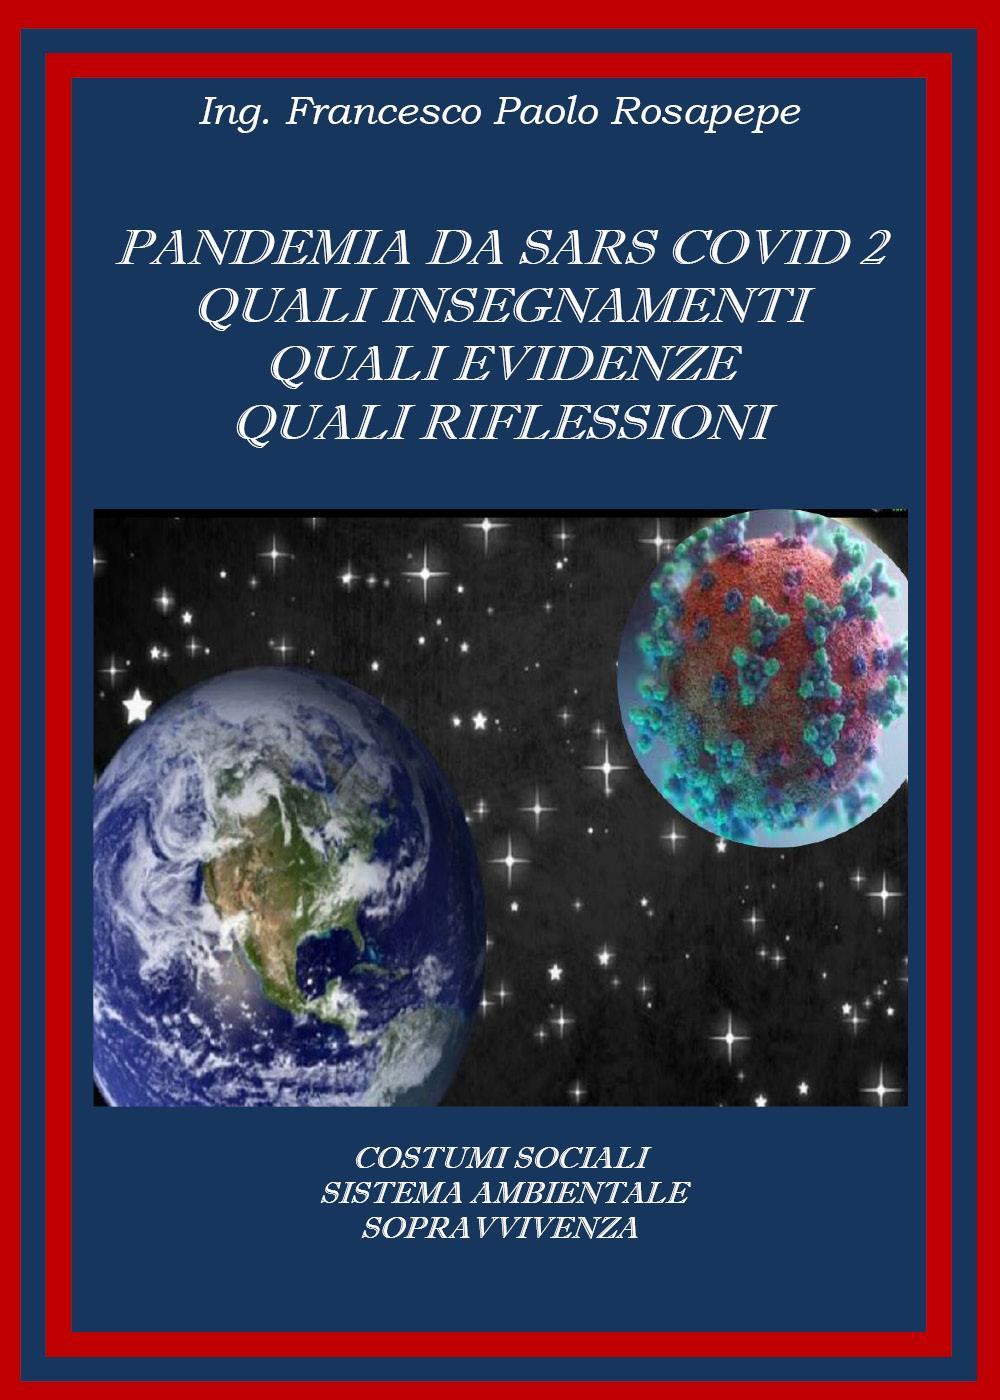 Pandemia da Sars Covid 2 – Quali insegnamenti, quali evidenze, quali riflessioni